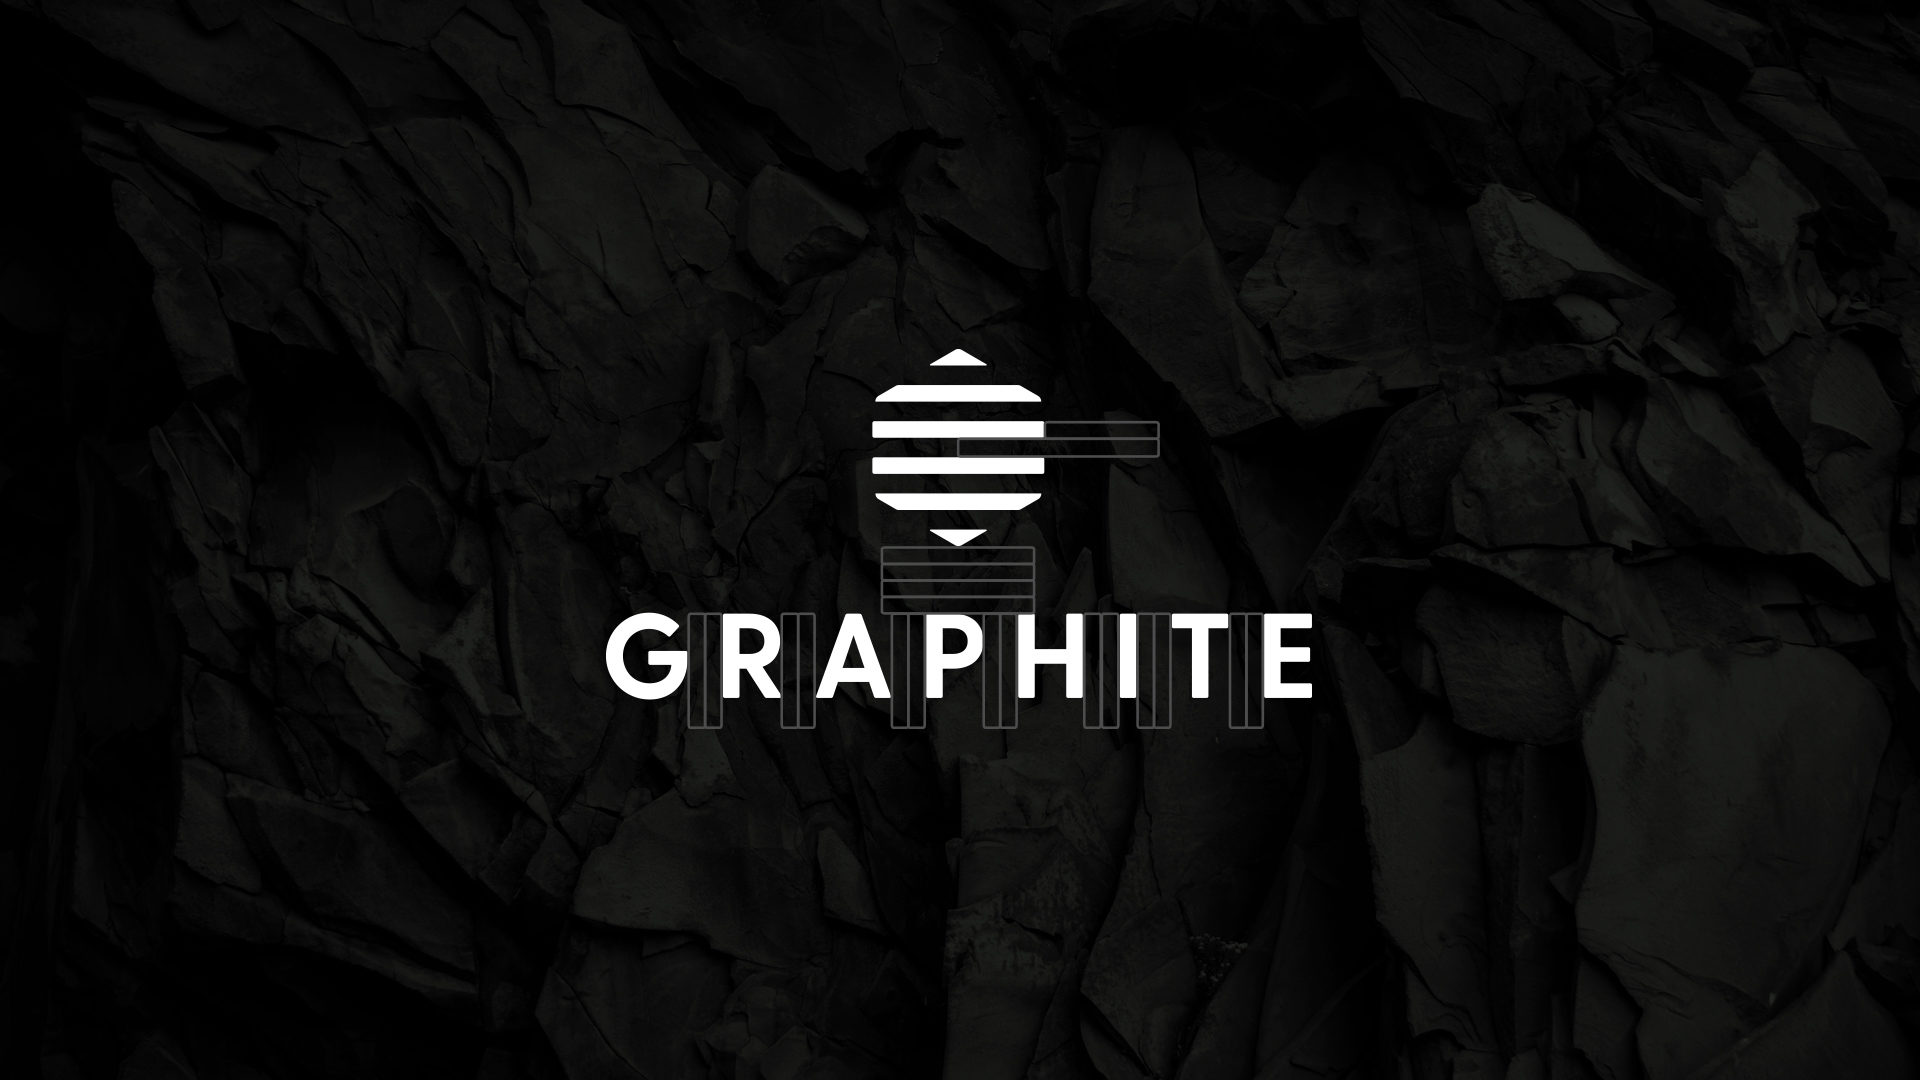 joshyouare-graphite-logo-rules.jpg